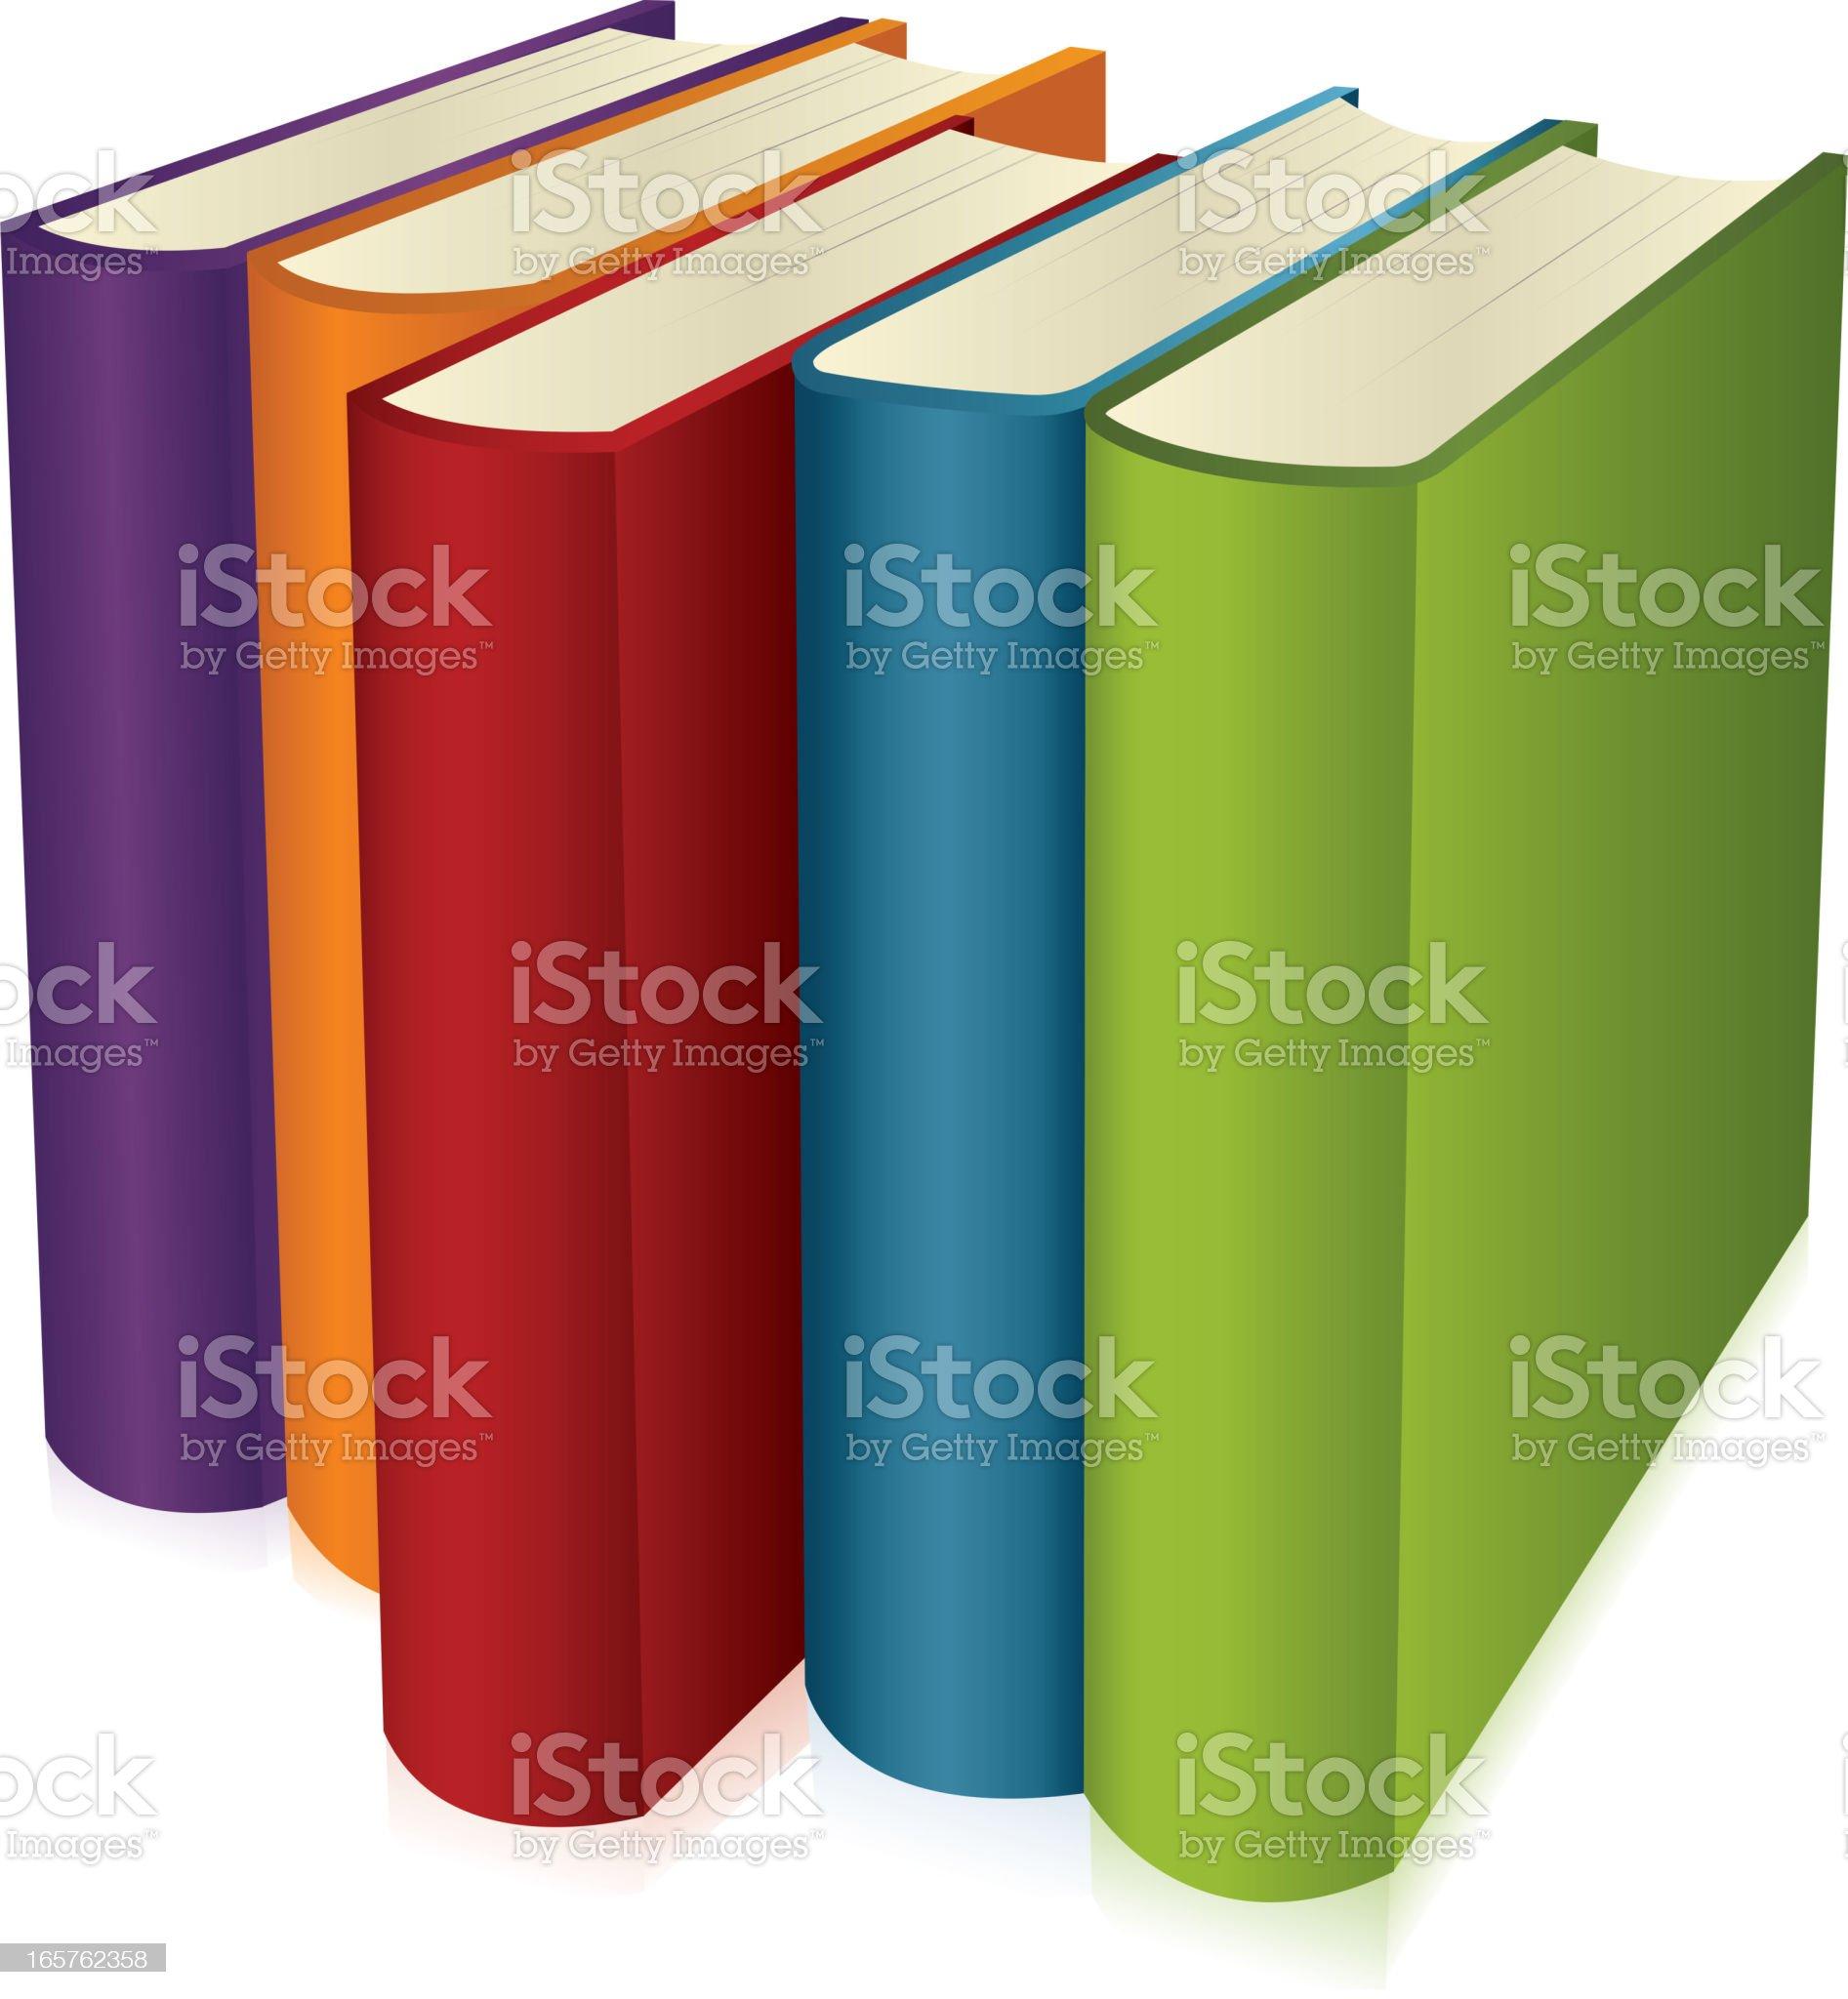 Books row royalty-free stock vector art